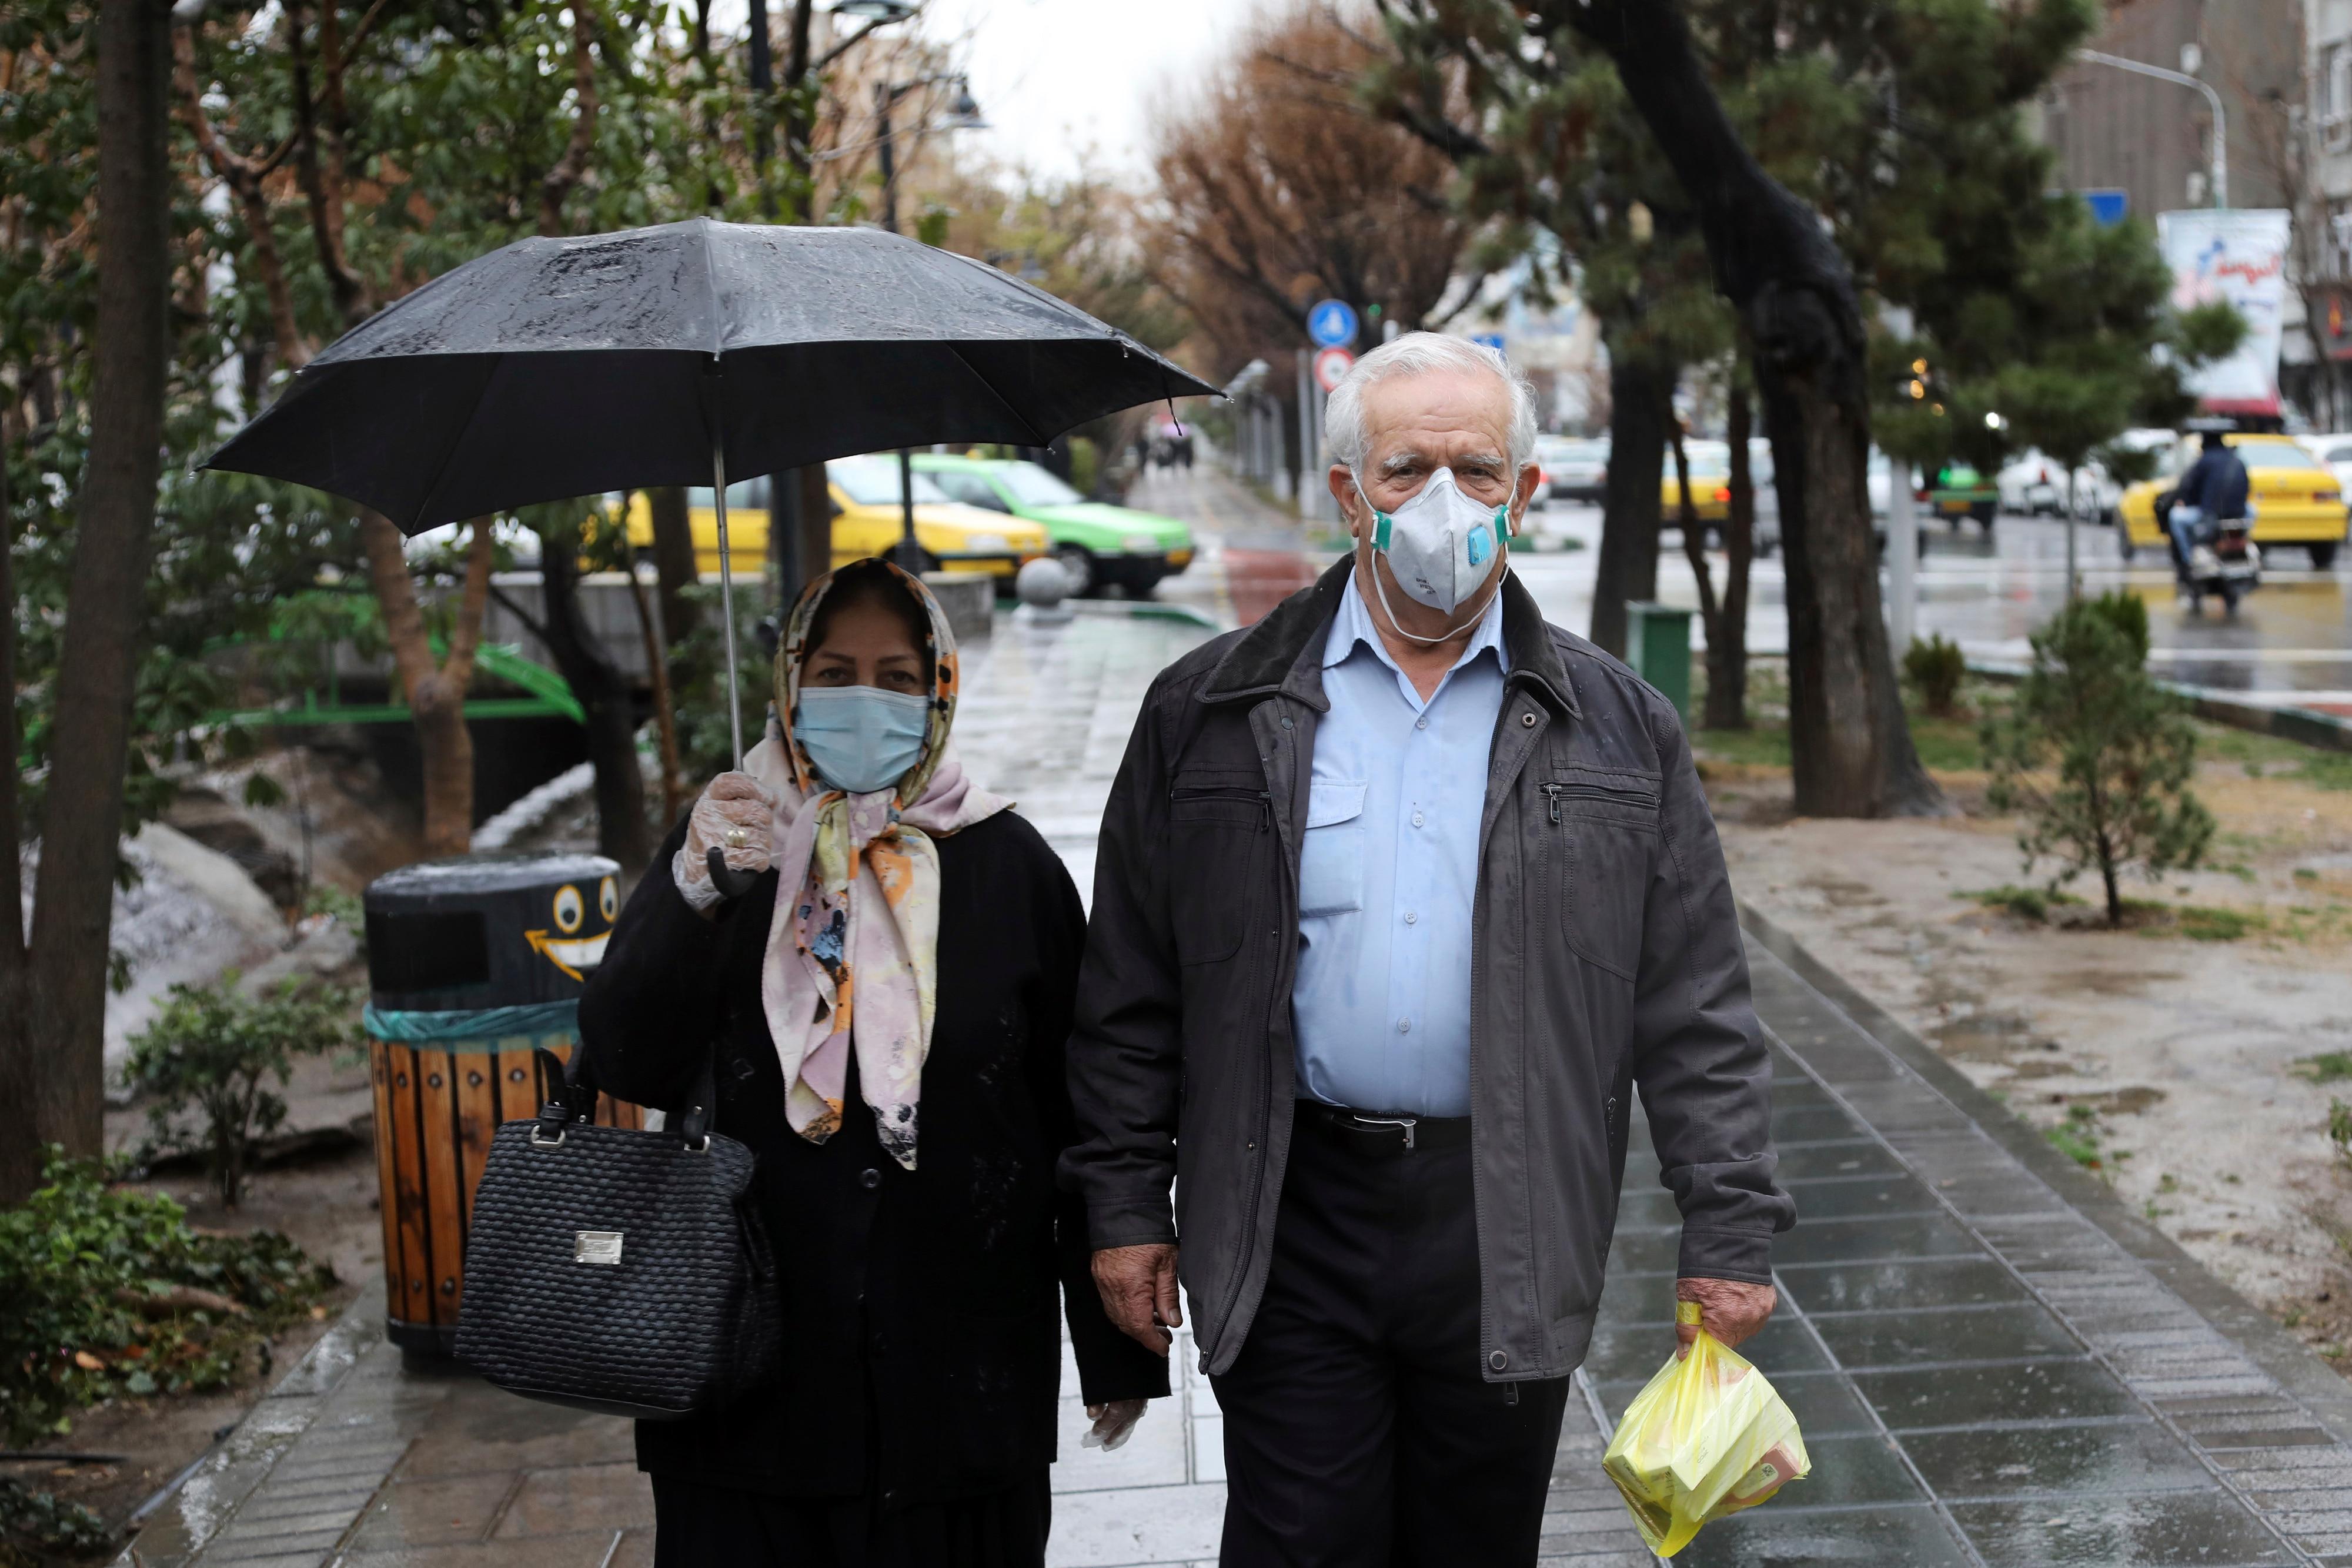 Pedestrians wear masks to help guard against the Coronavirus in downtown Tehran, Iran.